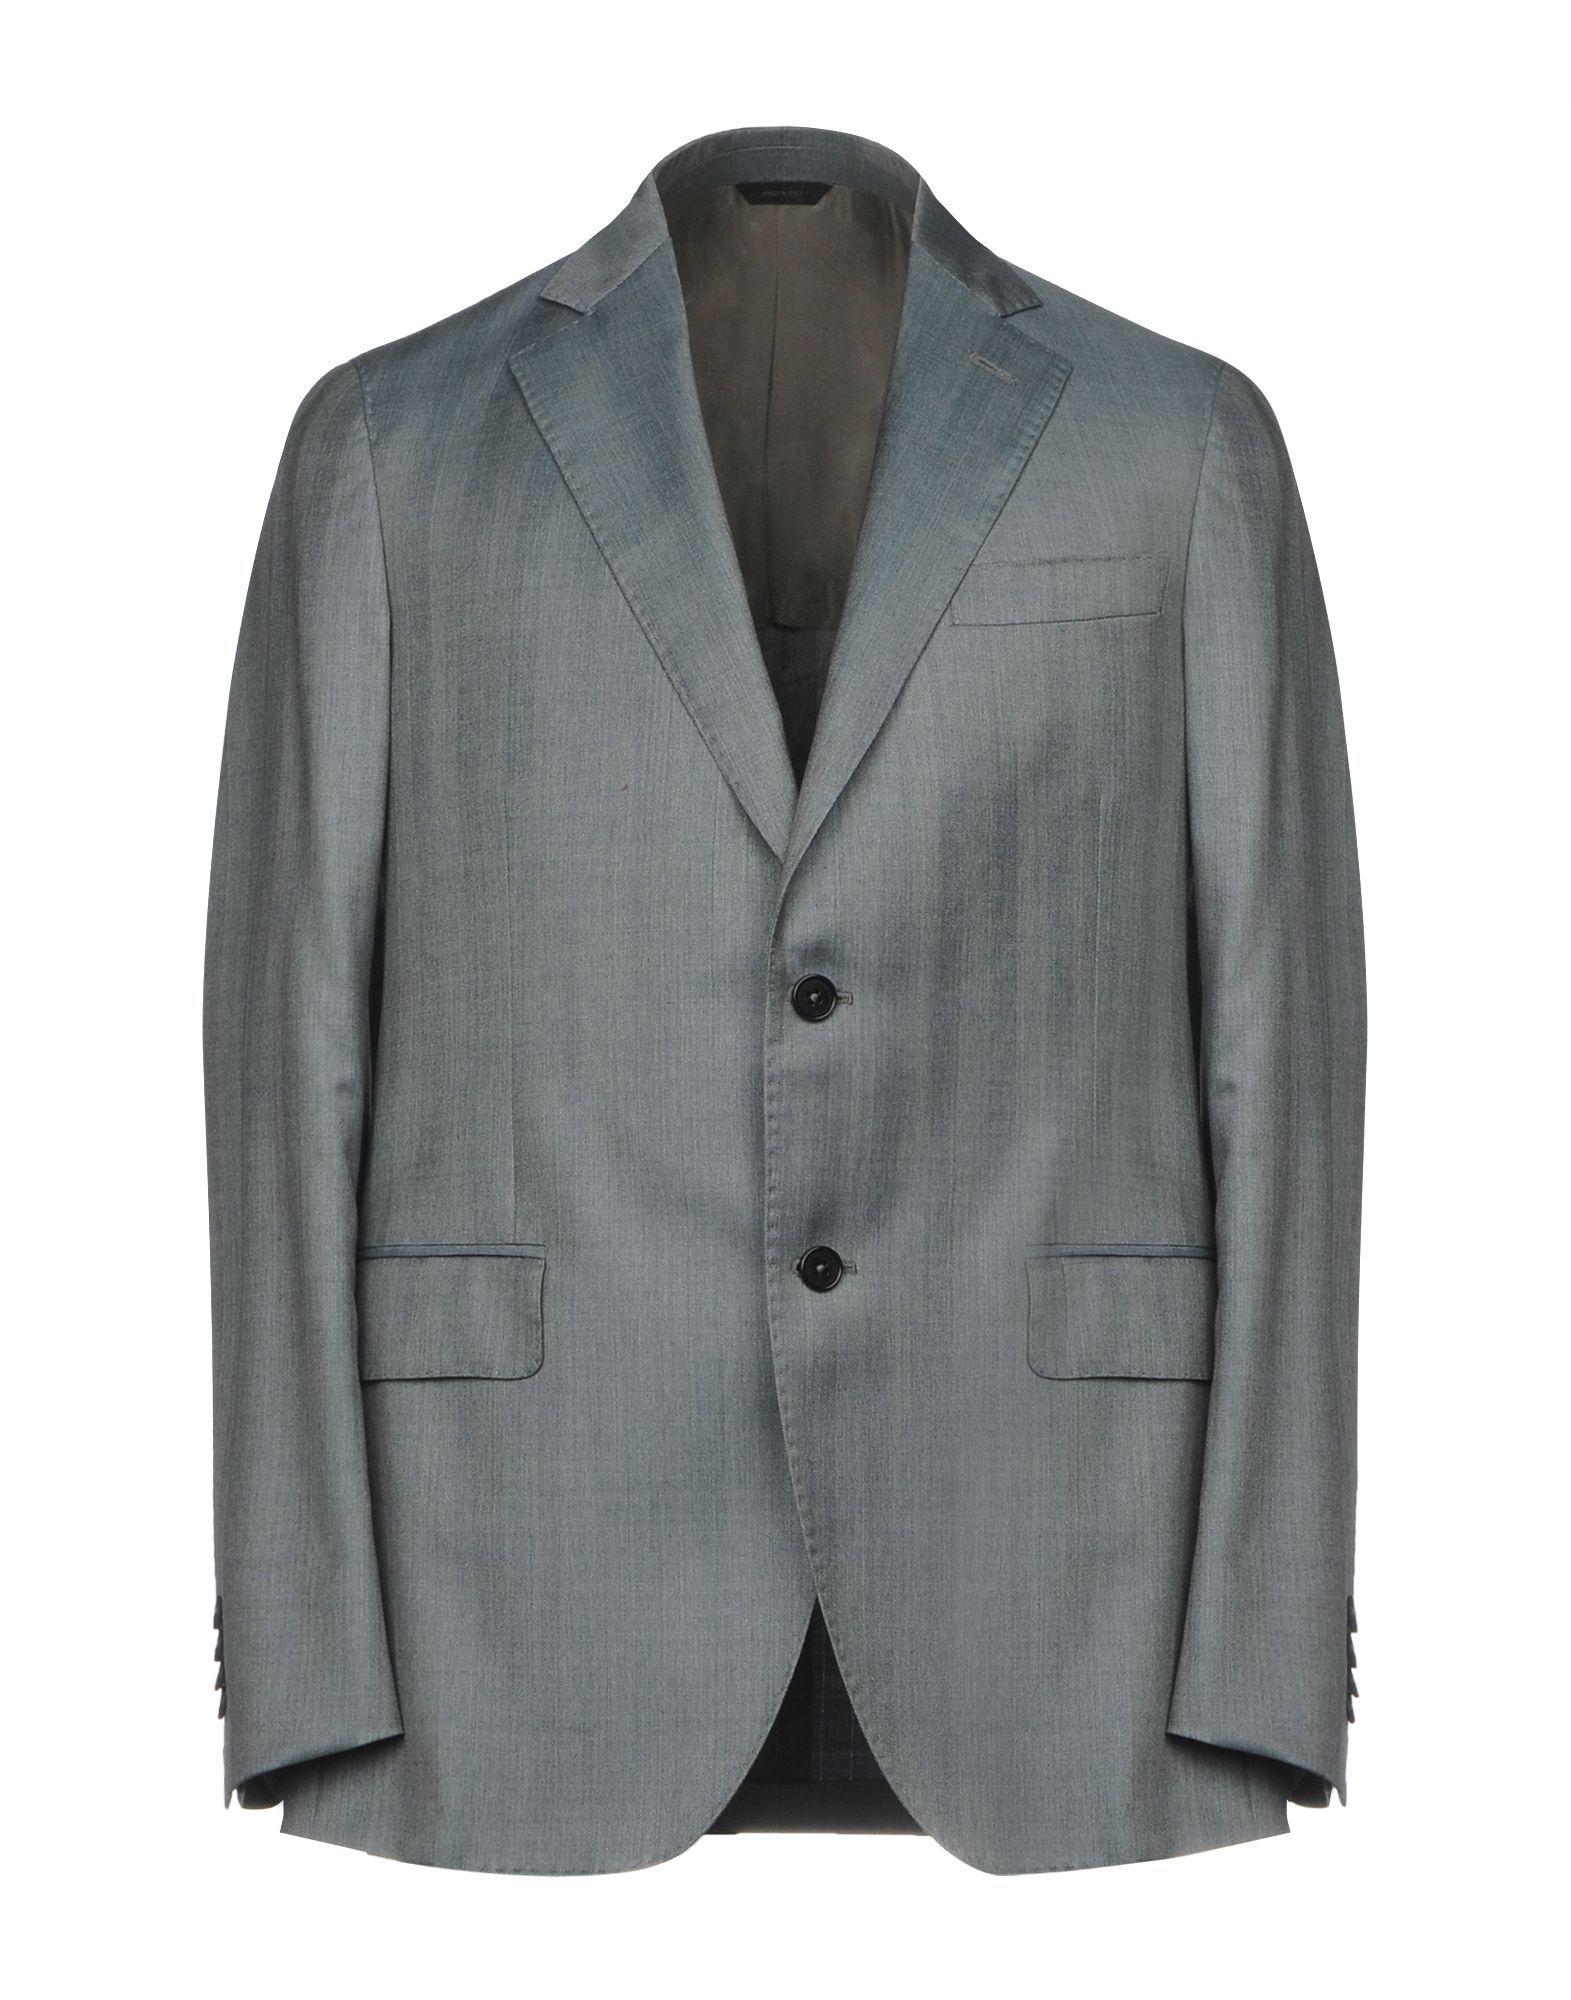 Tombolini Grey Virgin Wool Single Breasted Blazer